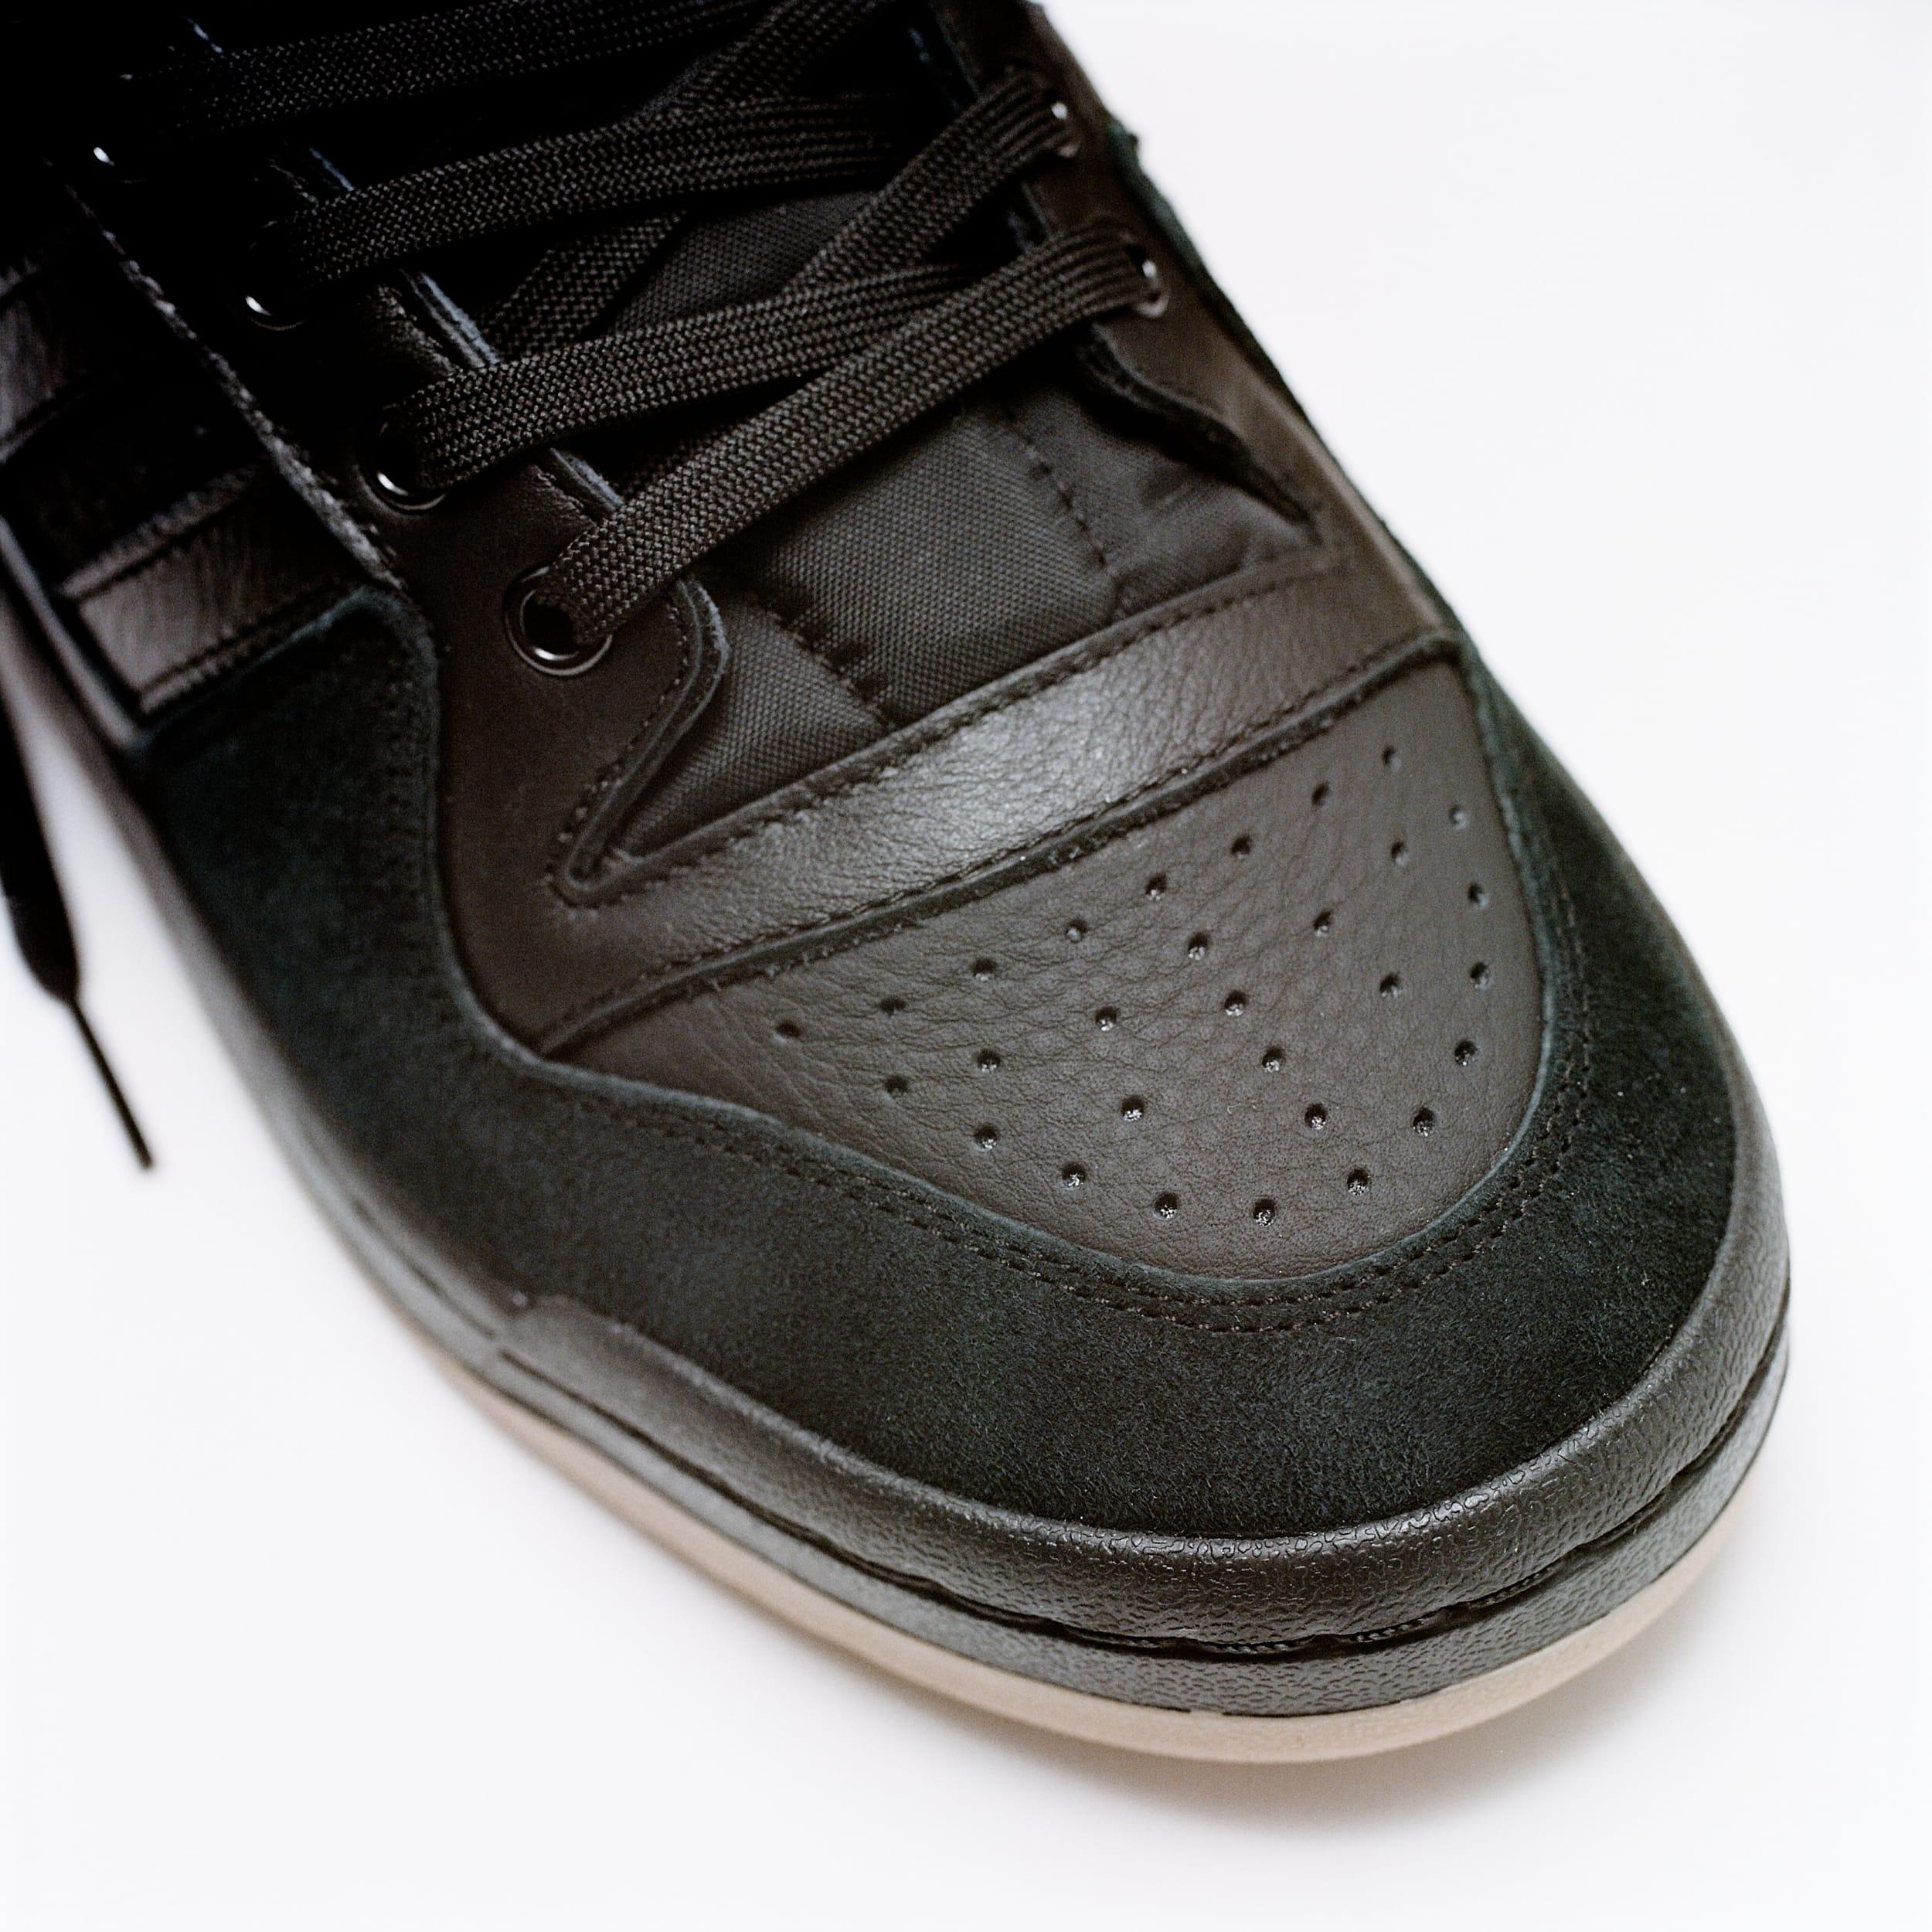 Adidas Forum 84 ADV Black Toe